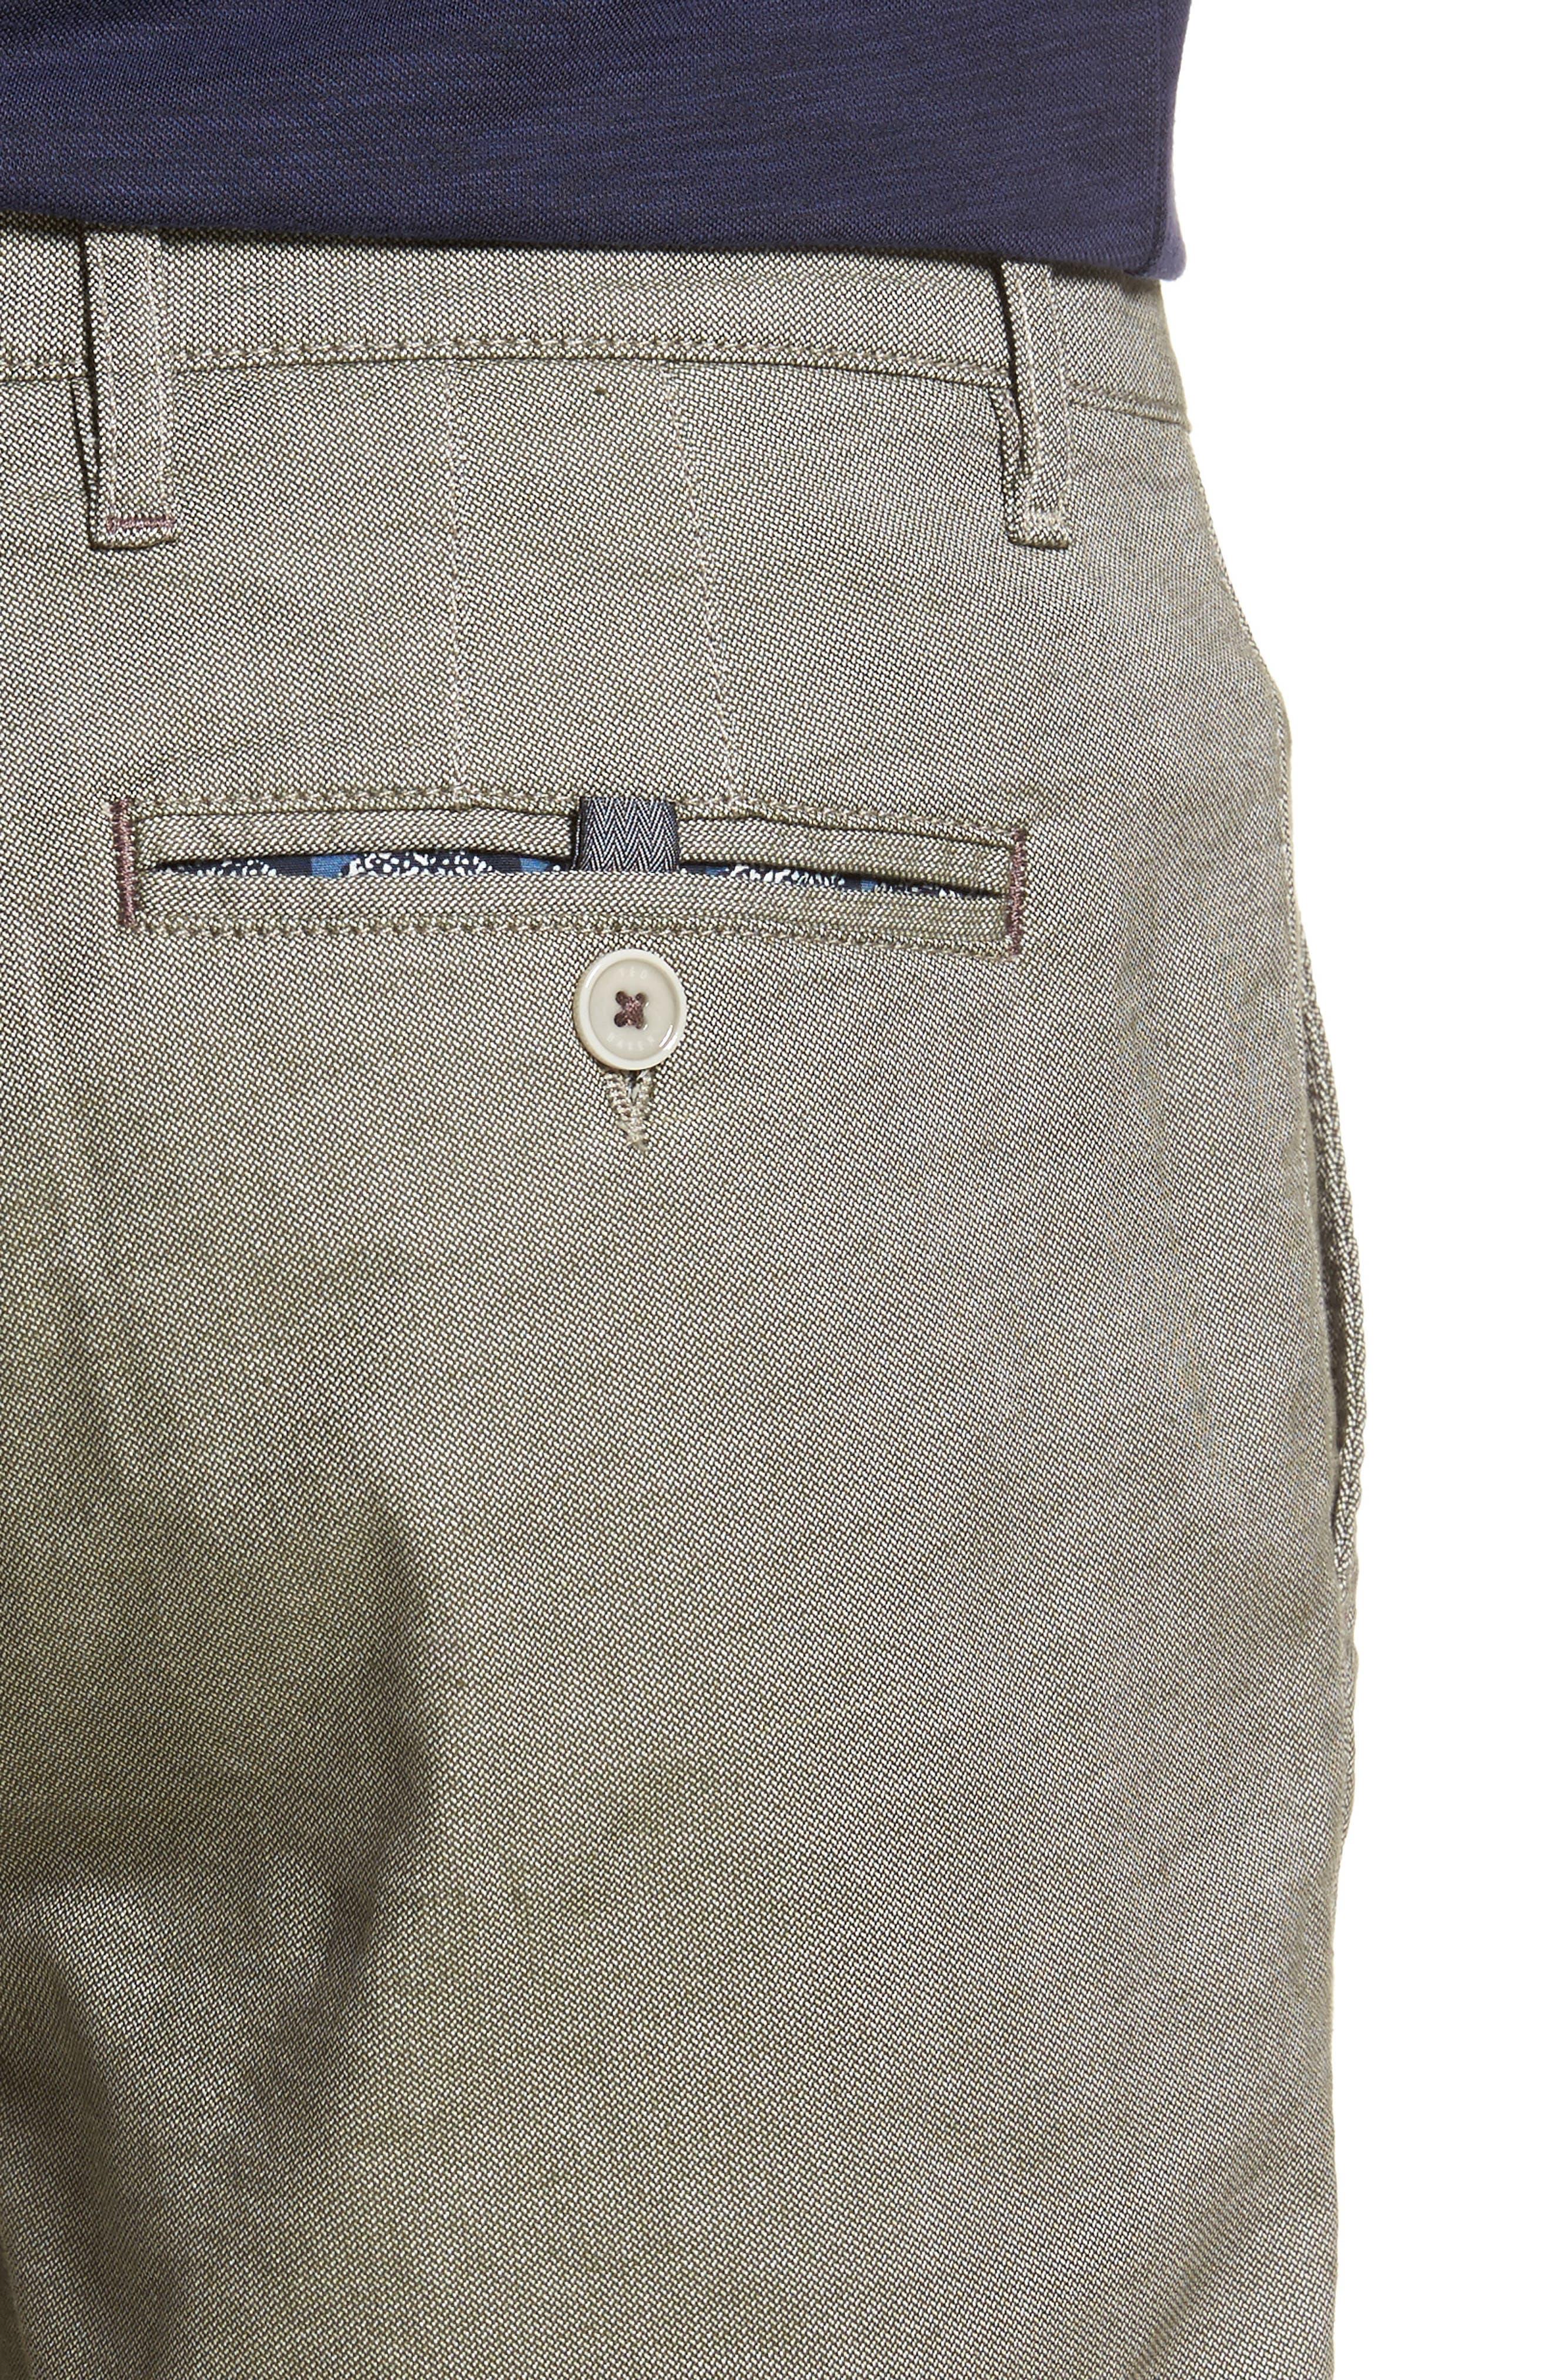 Herbosh Shorts,                             Alternate thumbnail 4, color,                             GREY MARL